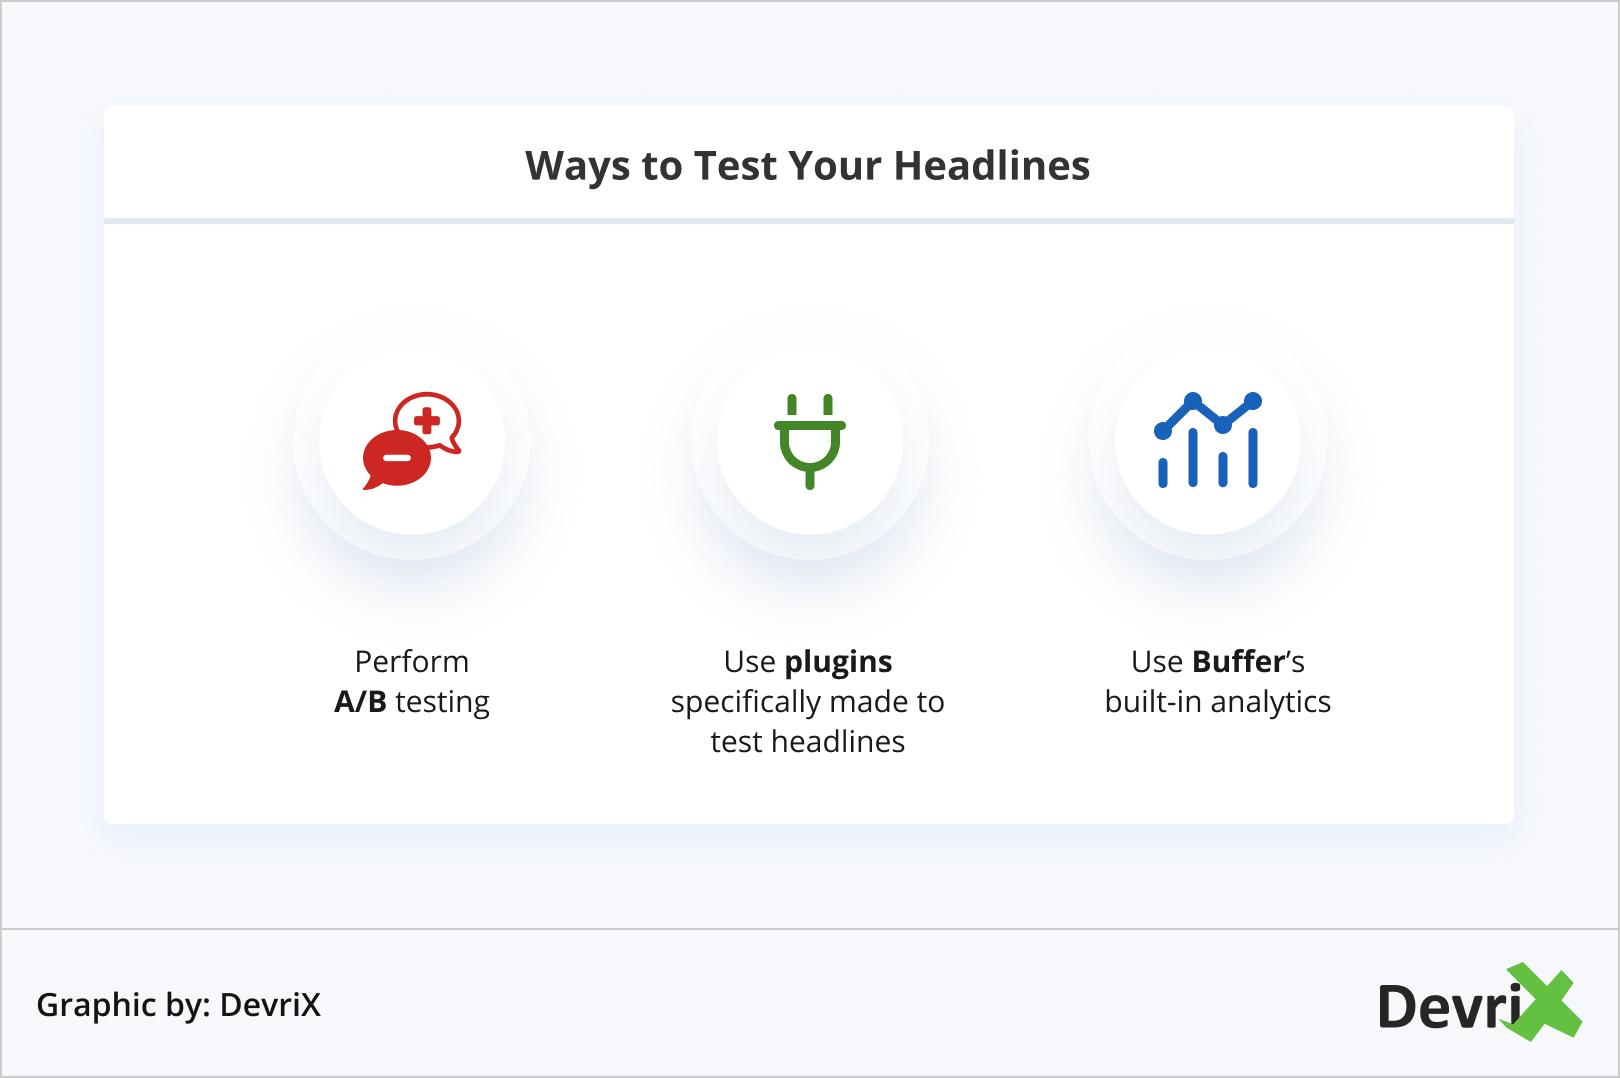 Ways to Test Your Headlines